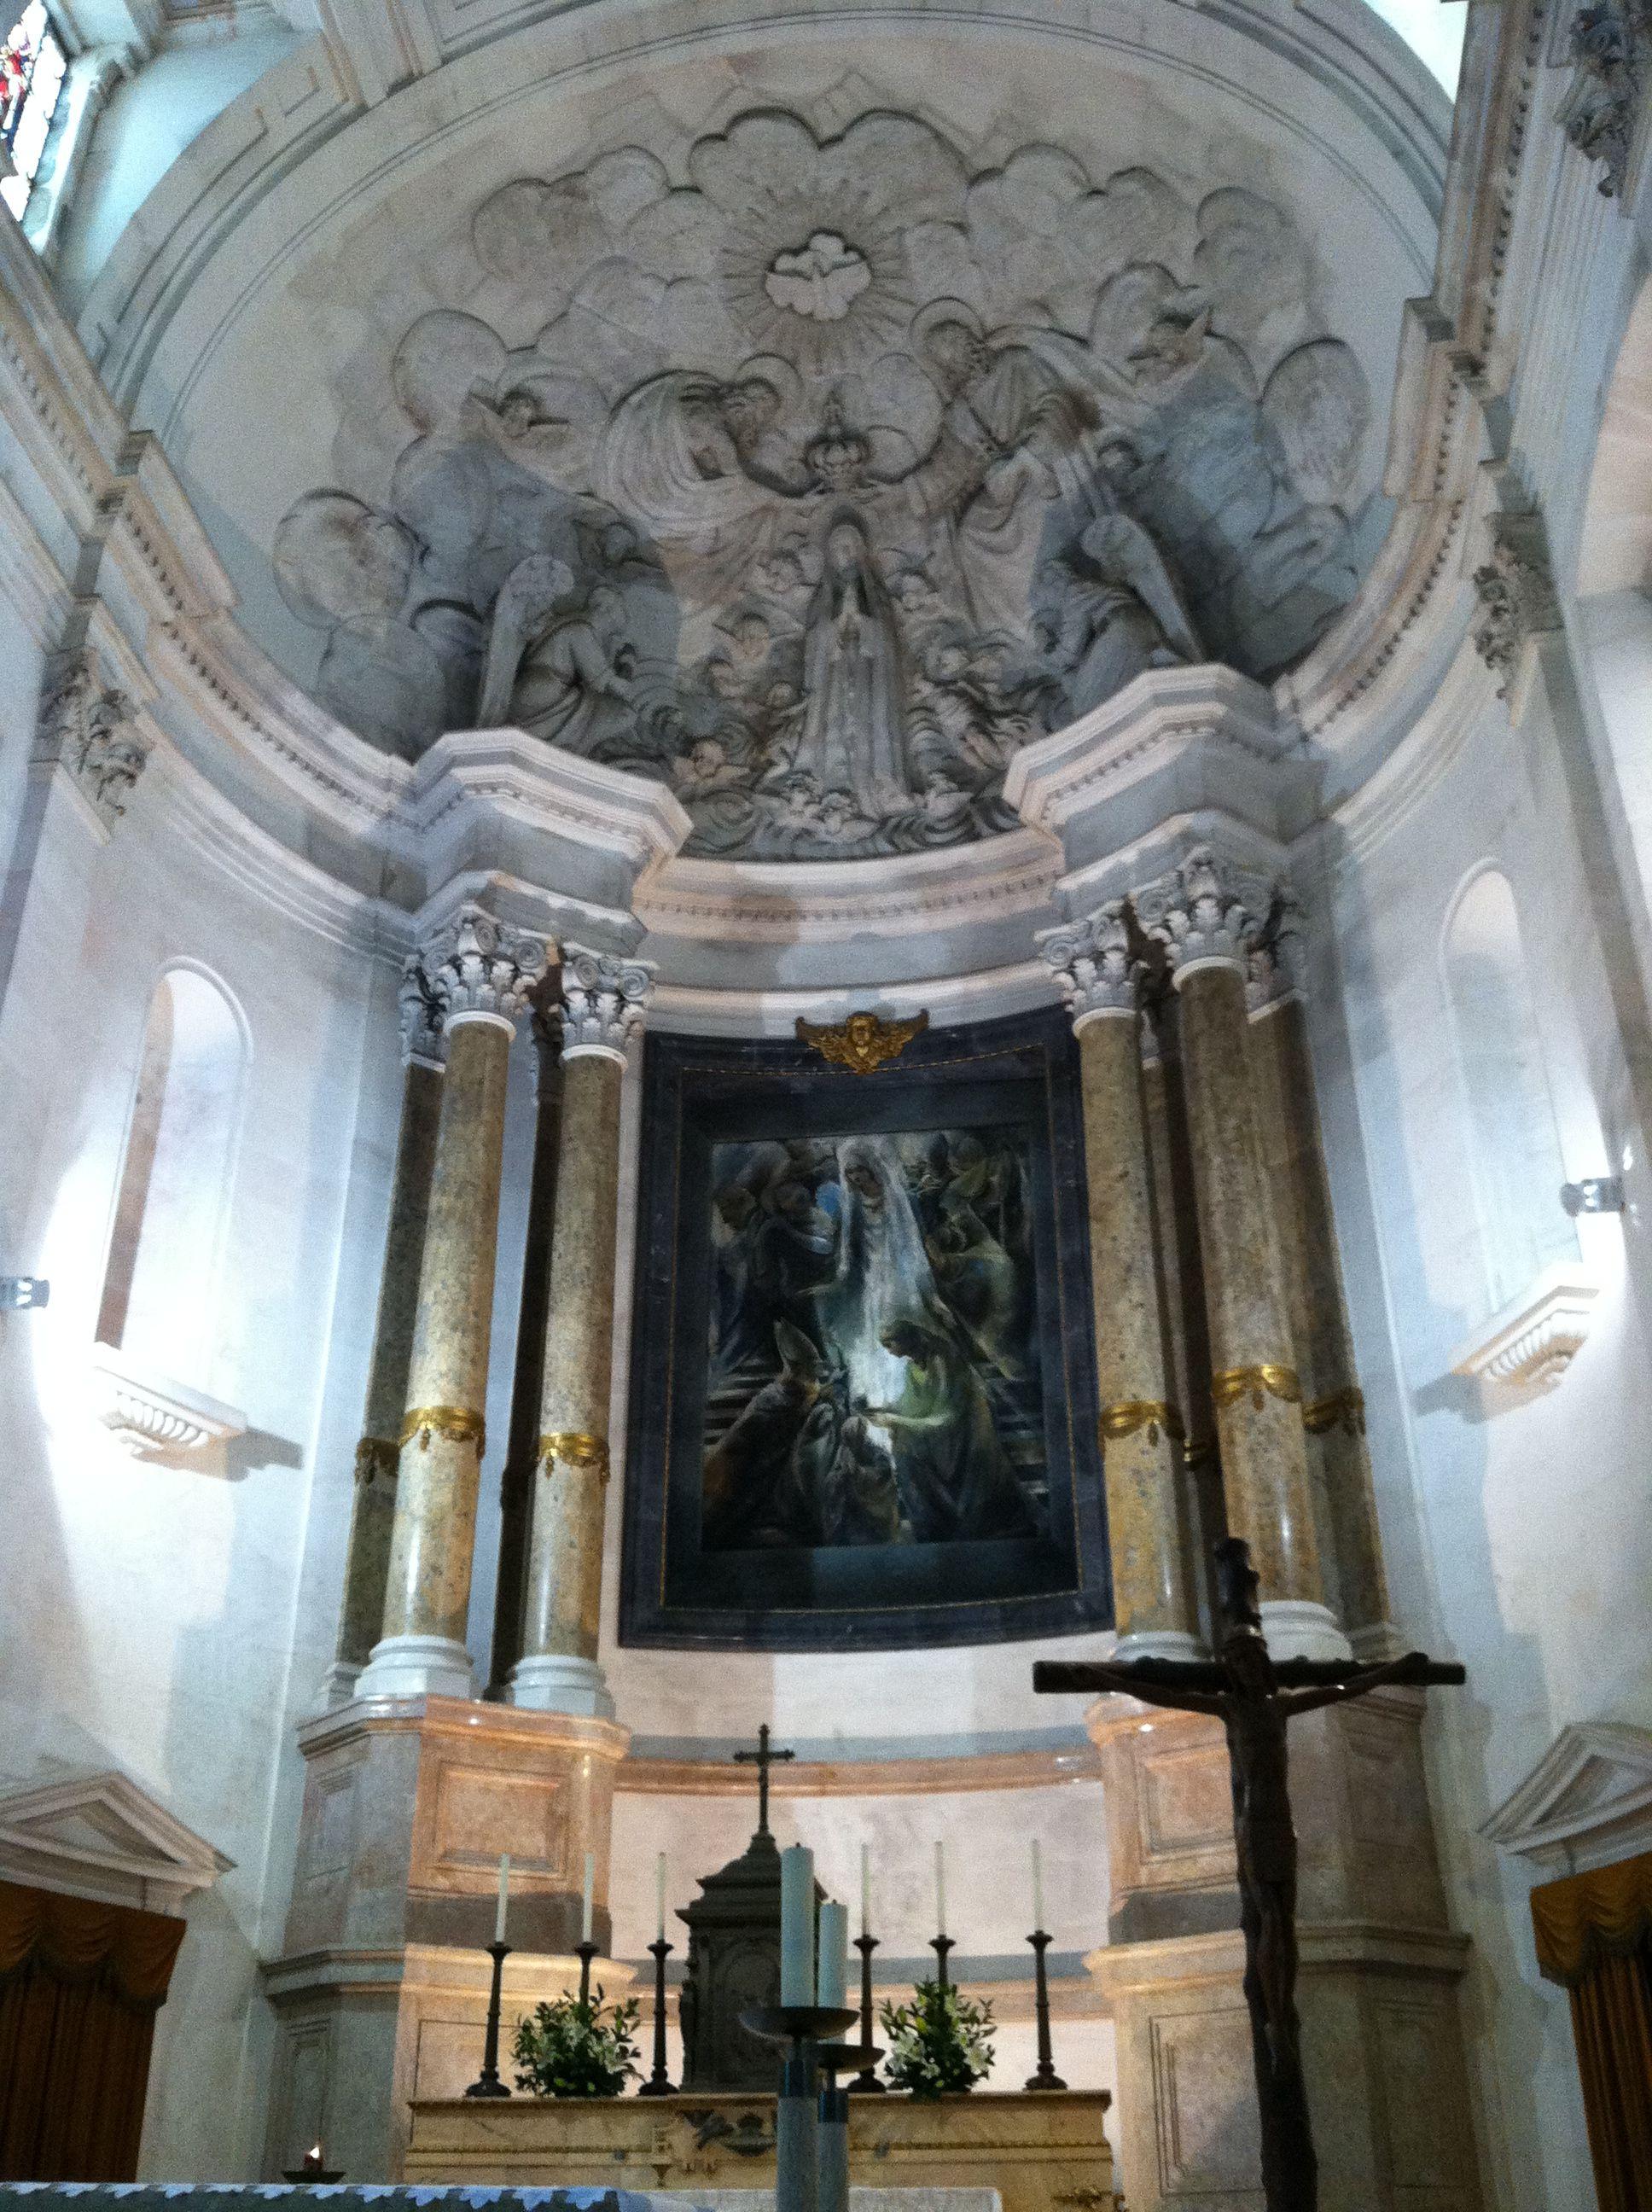 Fatima, Portugal (Inside